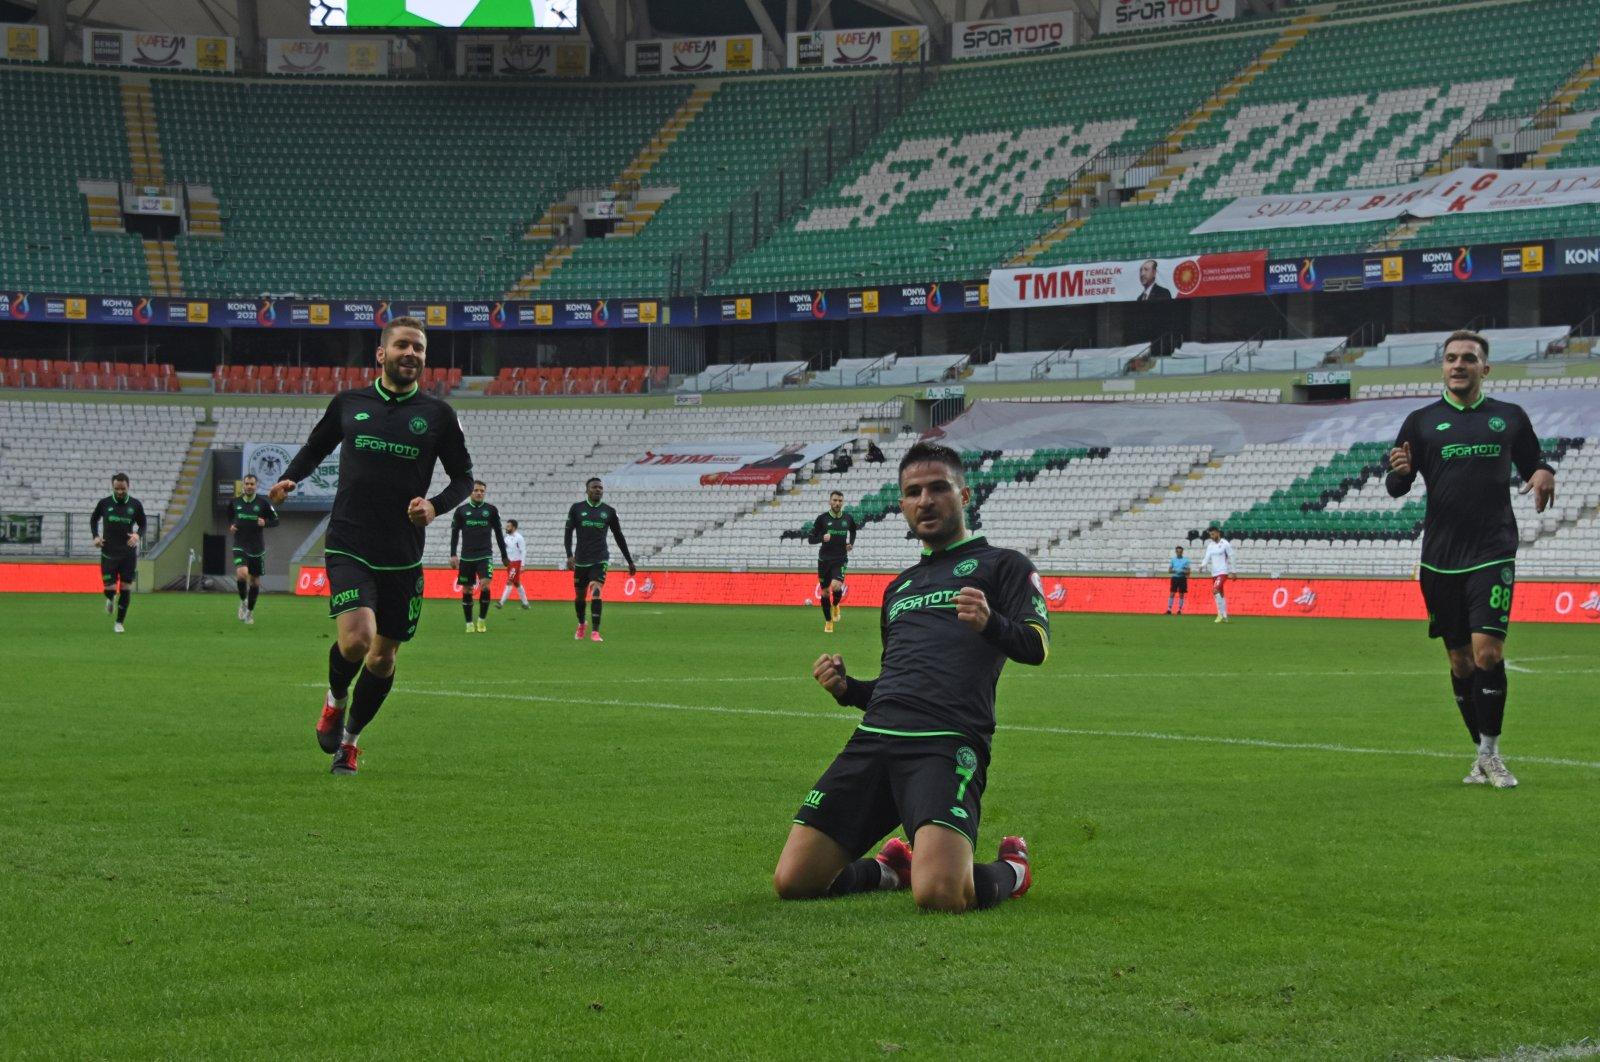 Konyaspor's Ömer Ali Şahiner (C) celebrates scoring a goal against Gaziantep in the Ziraat Turkish Cup Round of 16 match, in Konya, Turkey, Jan. 13, 2021. (DHA Photo)